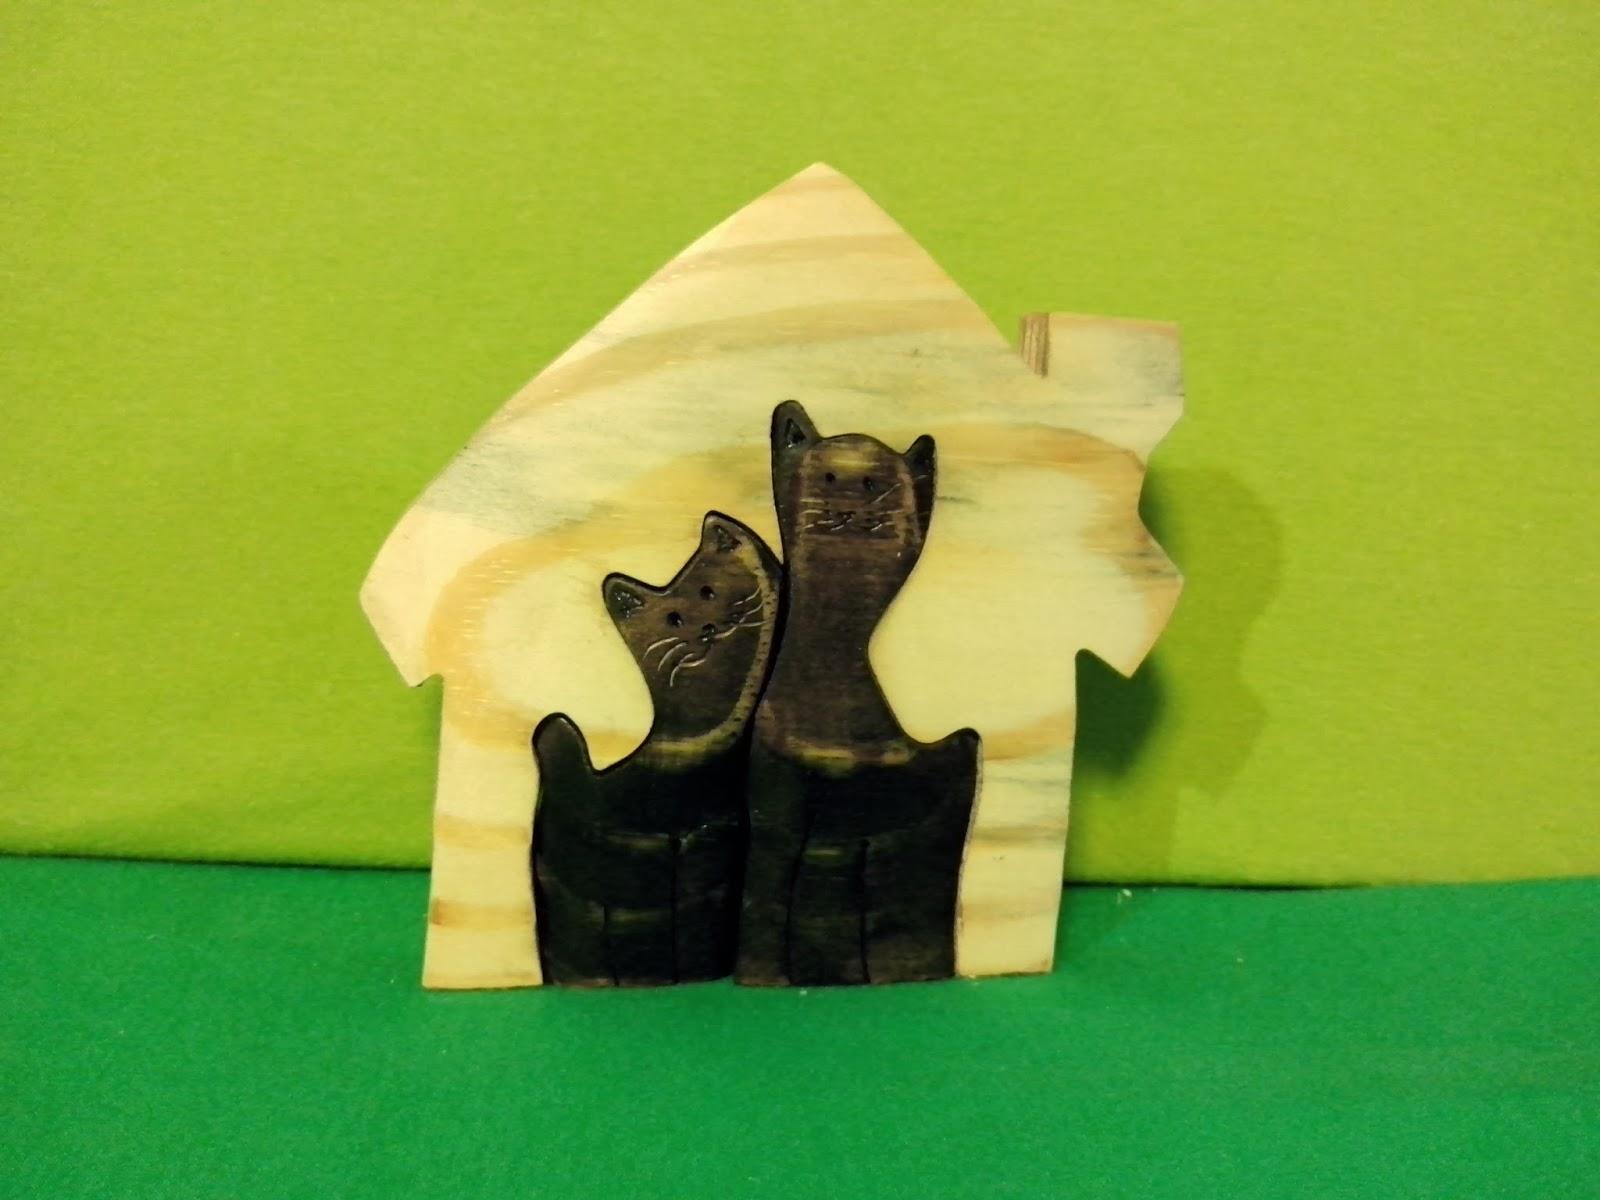 madeira artesanatos brasilia